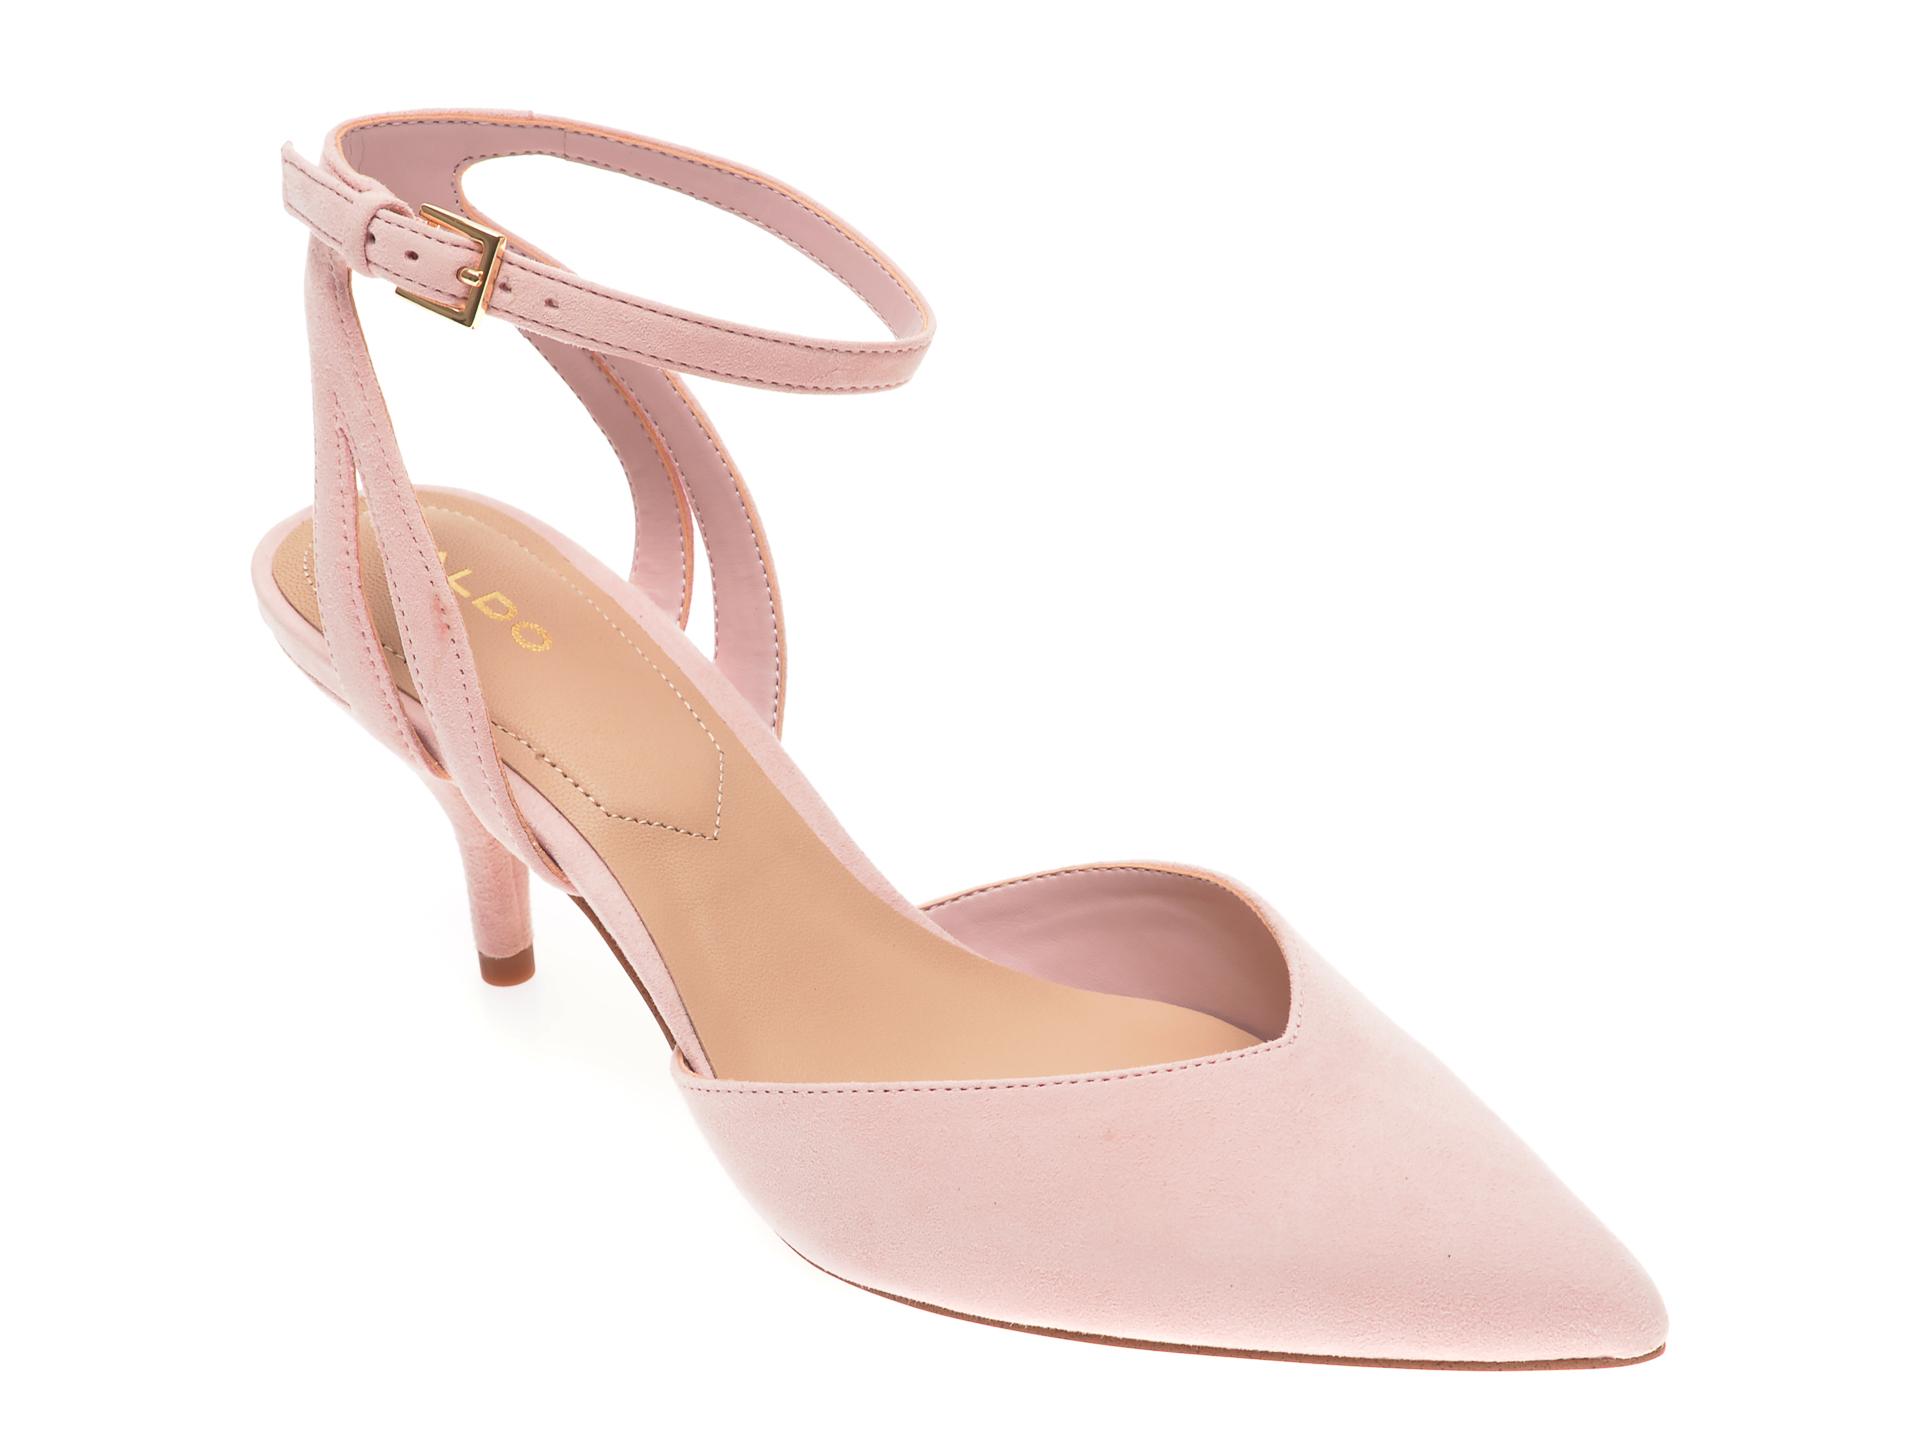 Pantofi ALDO roz, Krasnoya680, din piele intoarsa